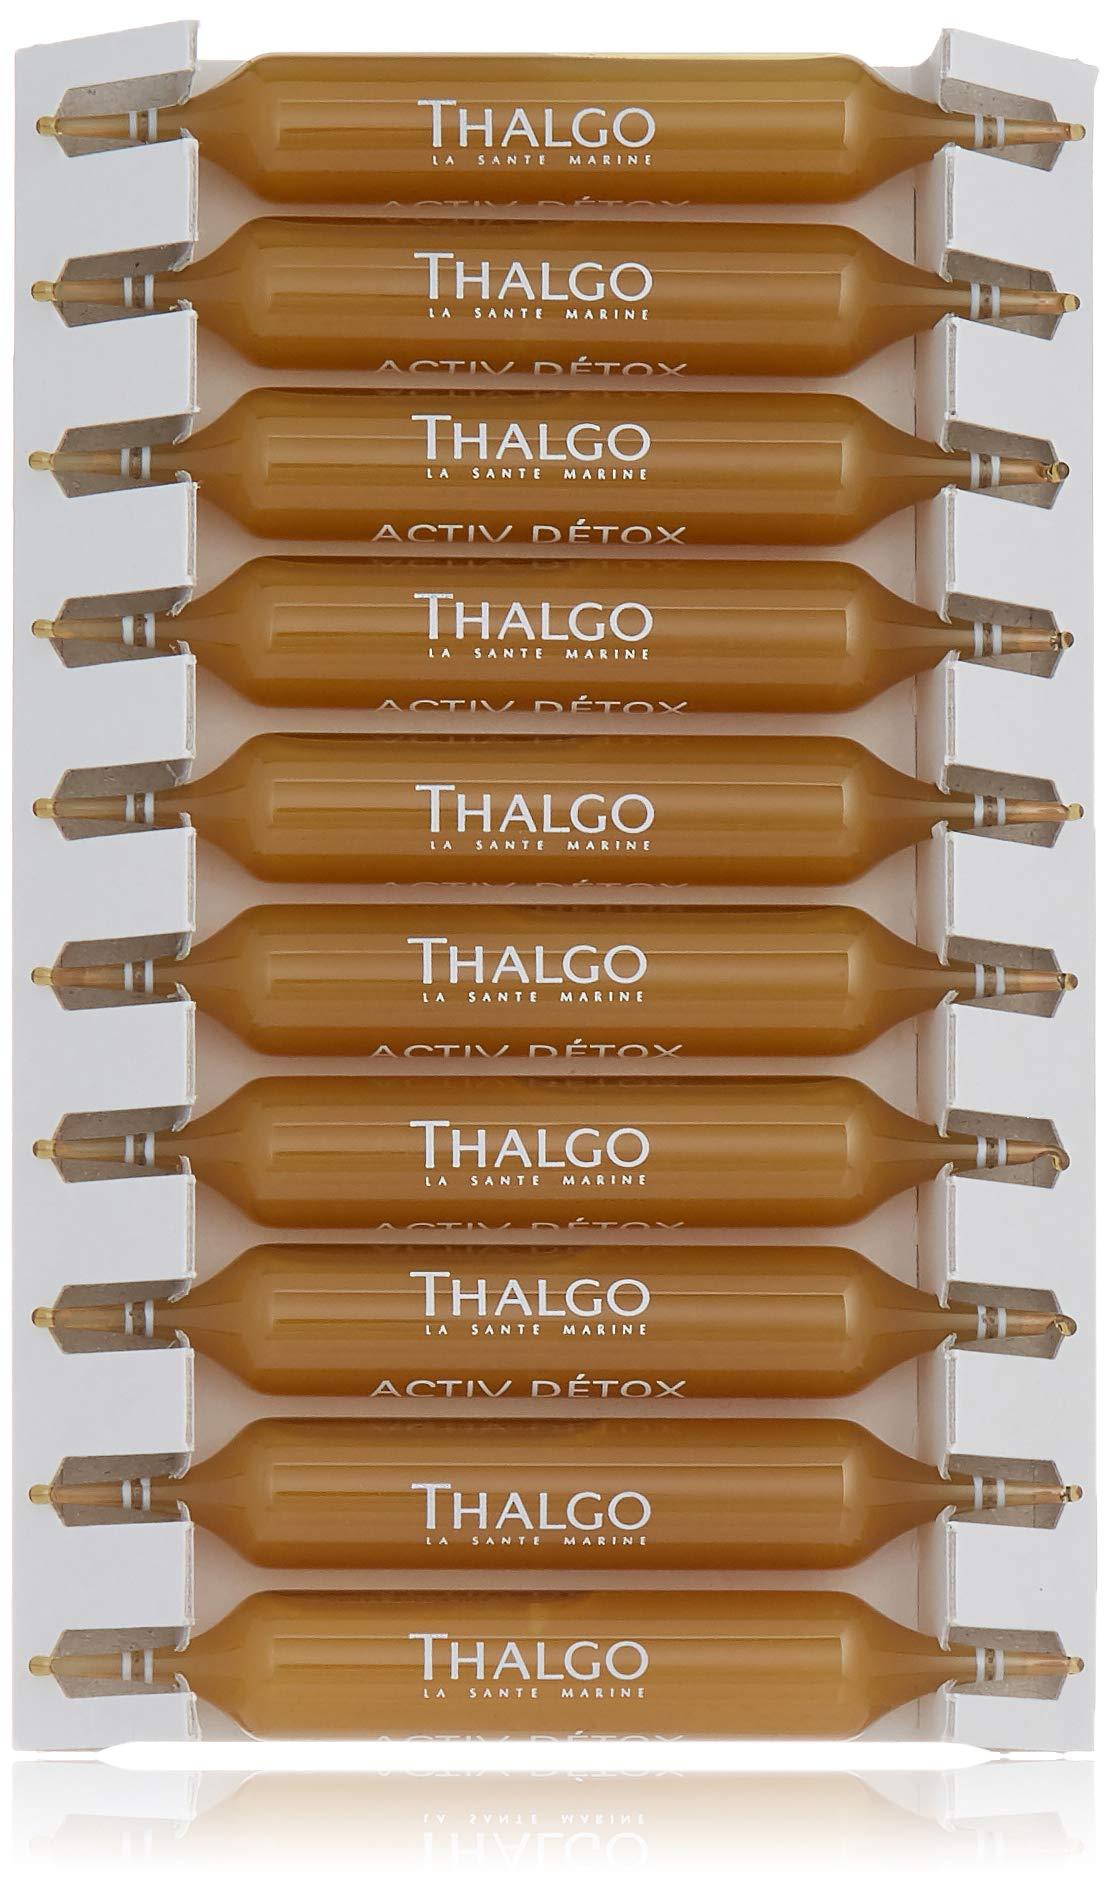 THALGO Activ Detox, 10 Count